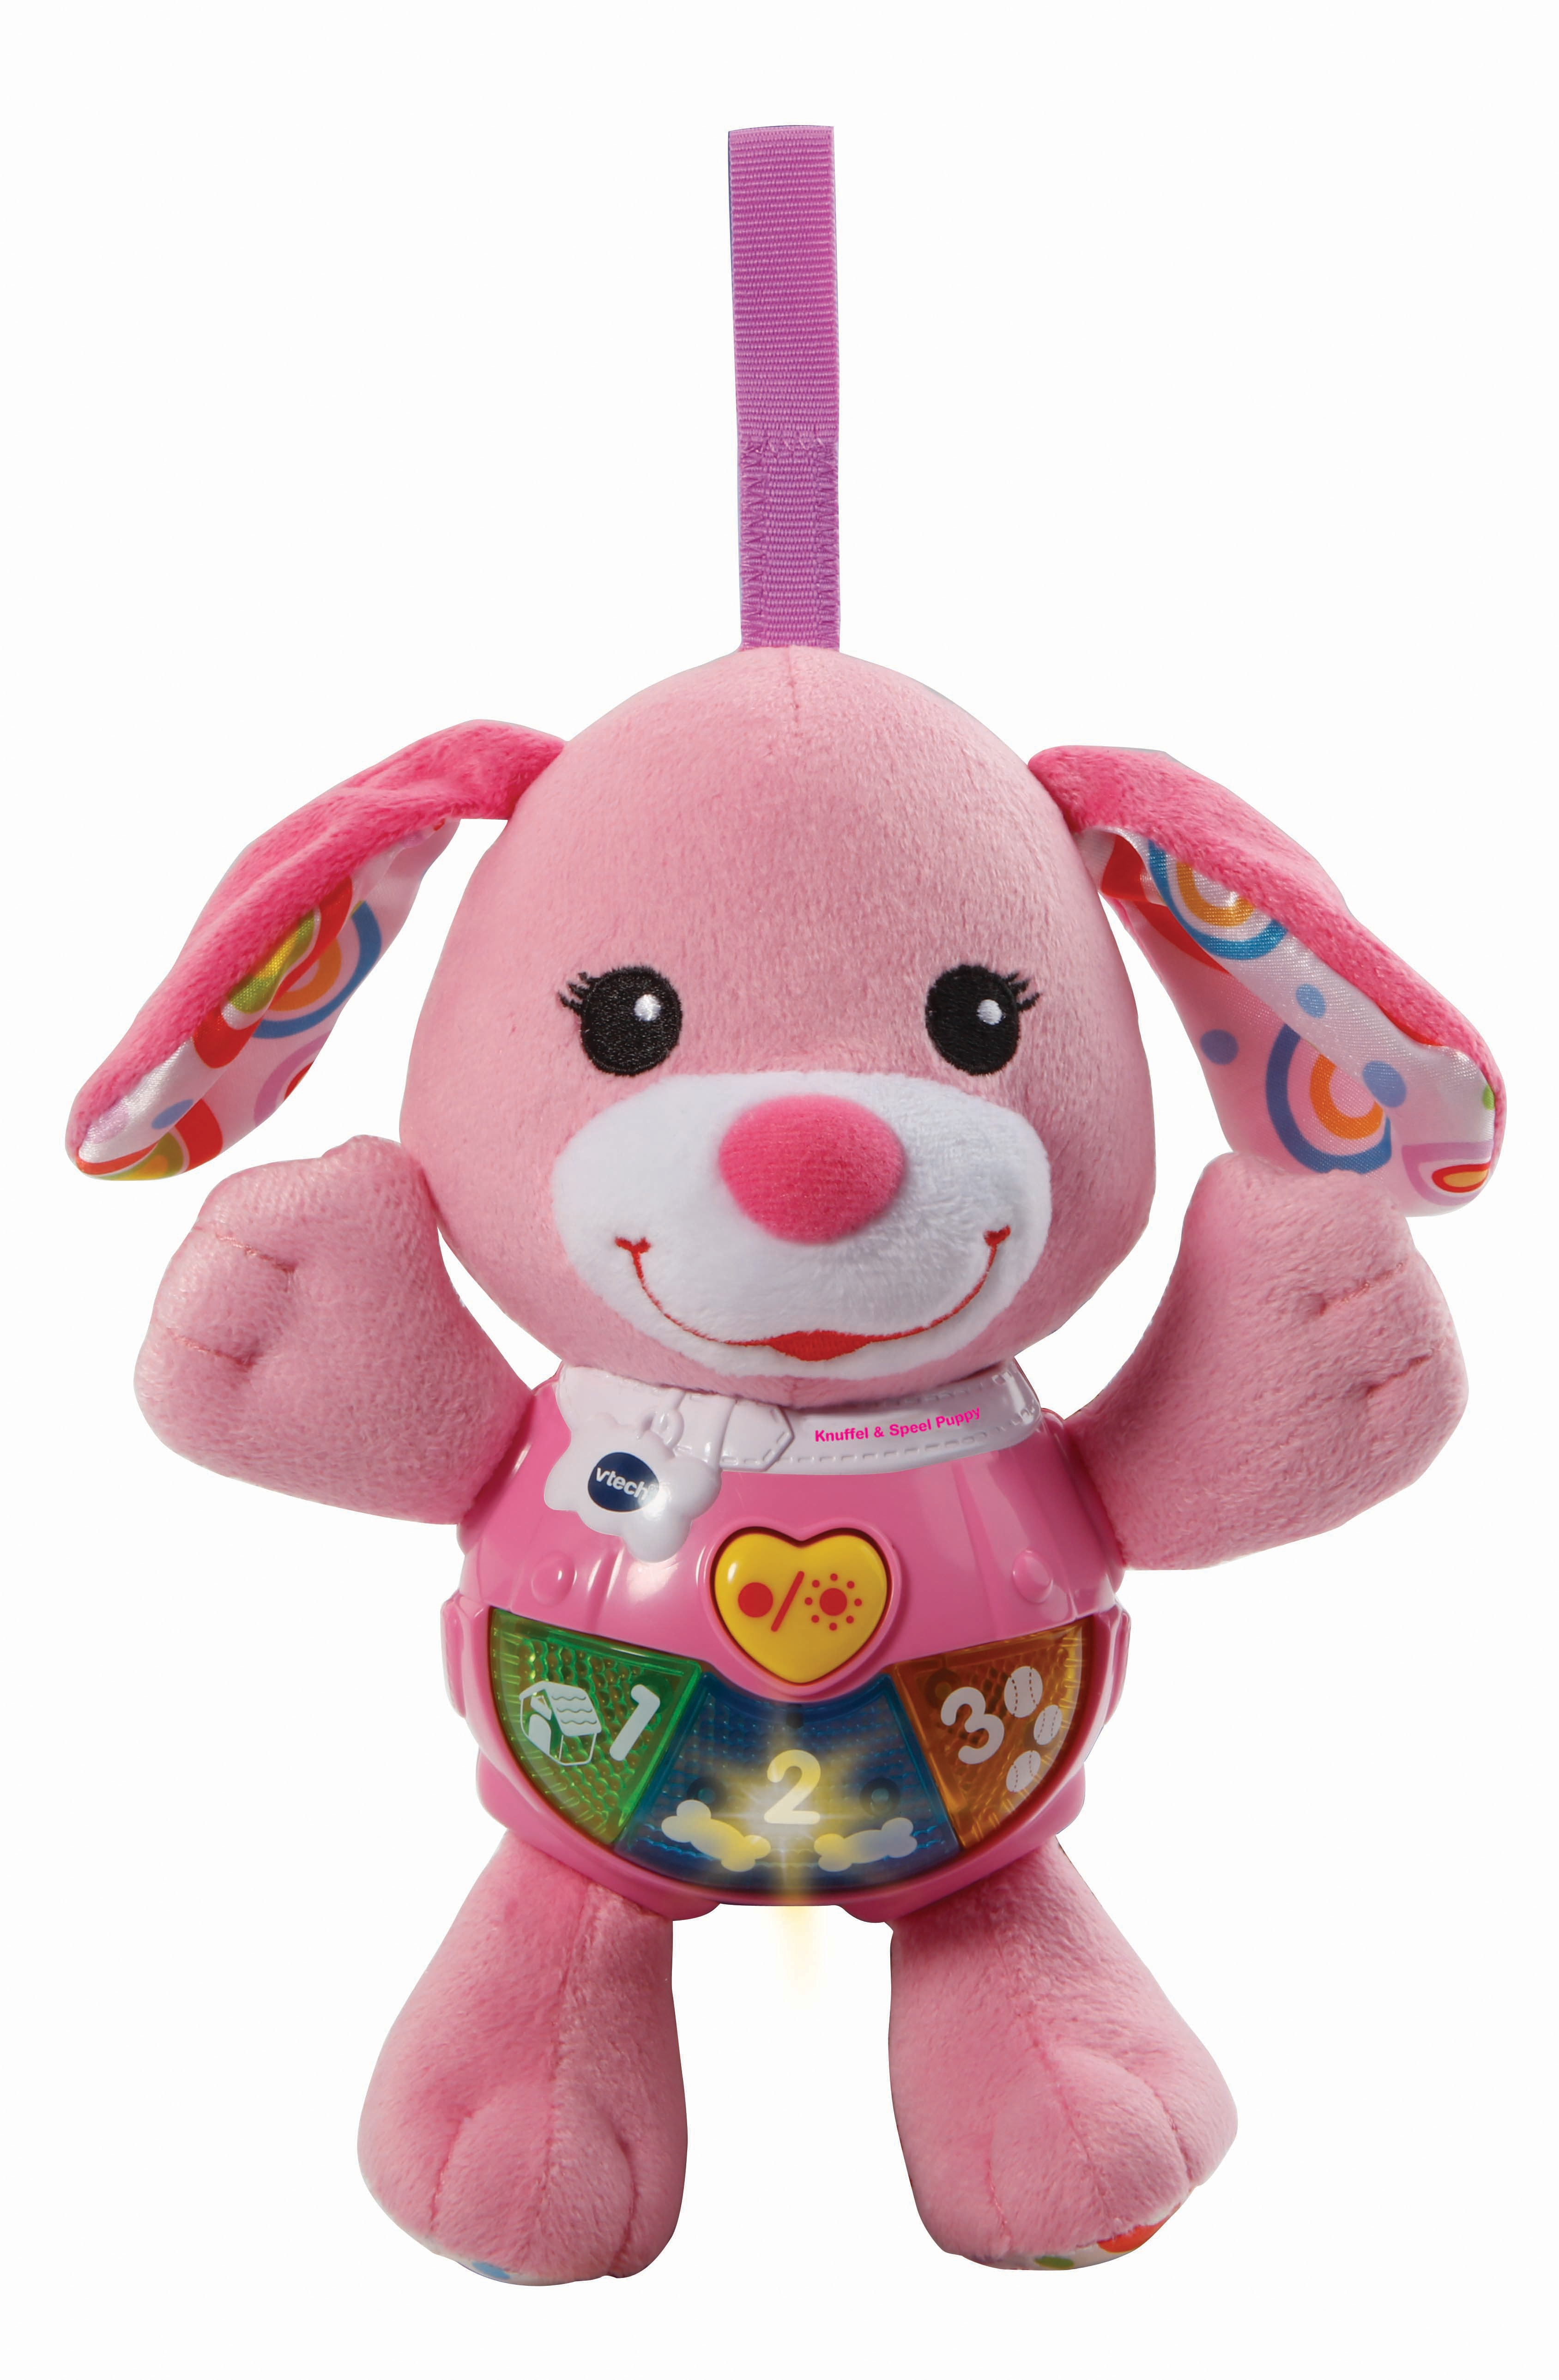 VTech Baby Knuffel & Speel Puppy roze Ragazza giocattolo educativo